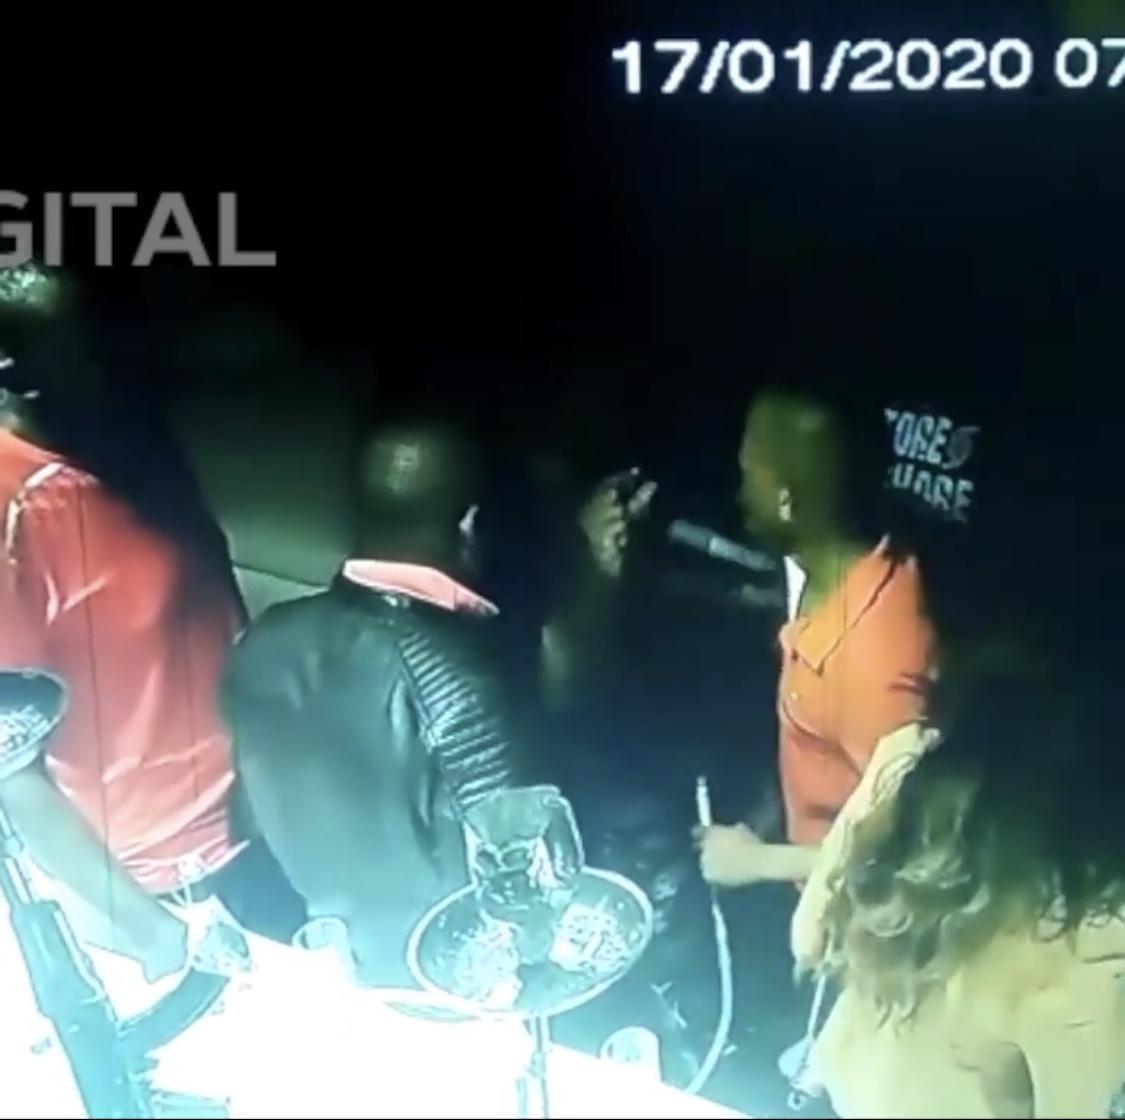 CCTV footage of Babu Owino shooting DJ Evolve emerges online